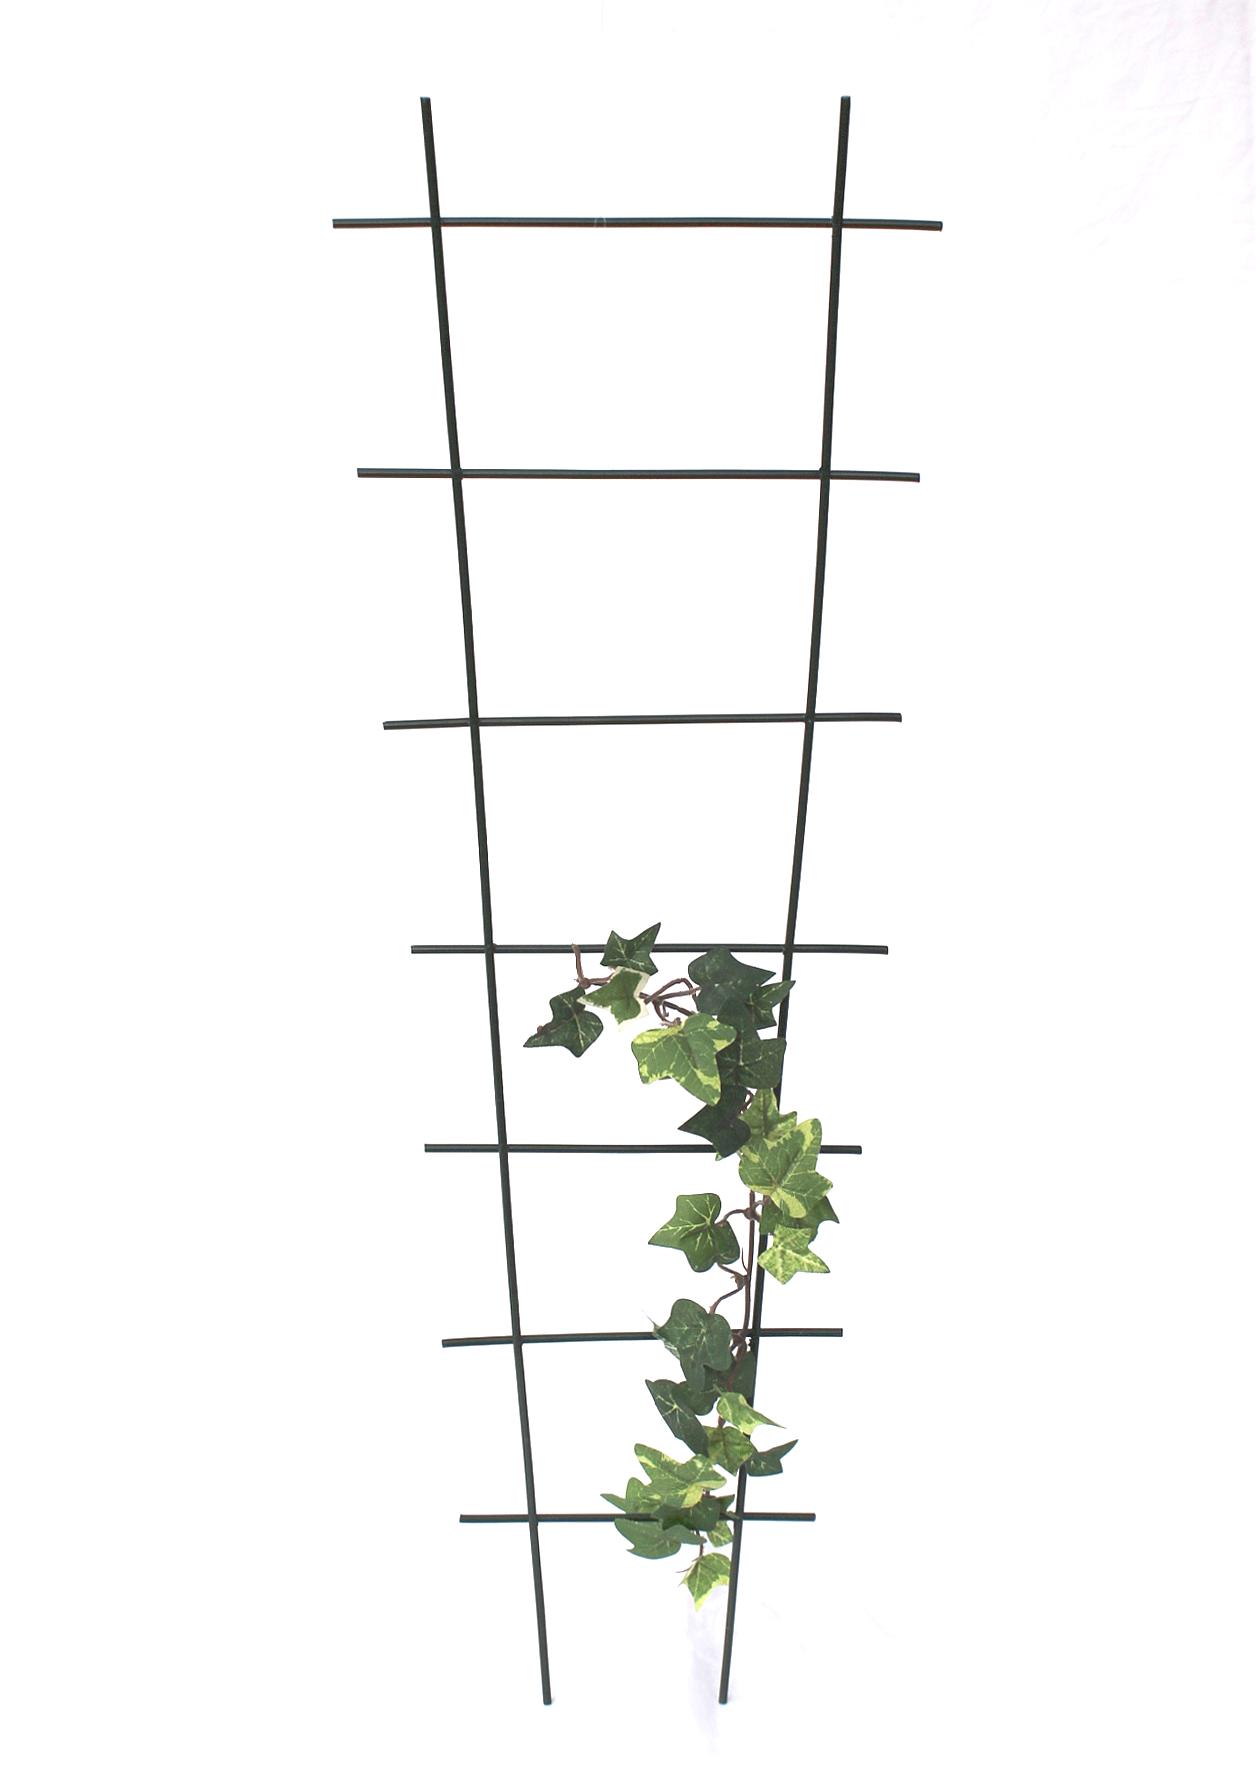 rankhilfe rankgitter art.307 kletterhilfe aus metall 65cm grün